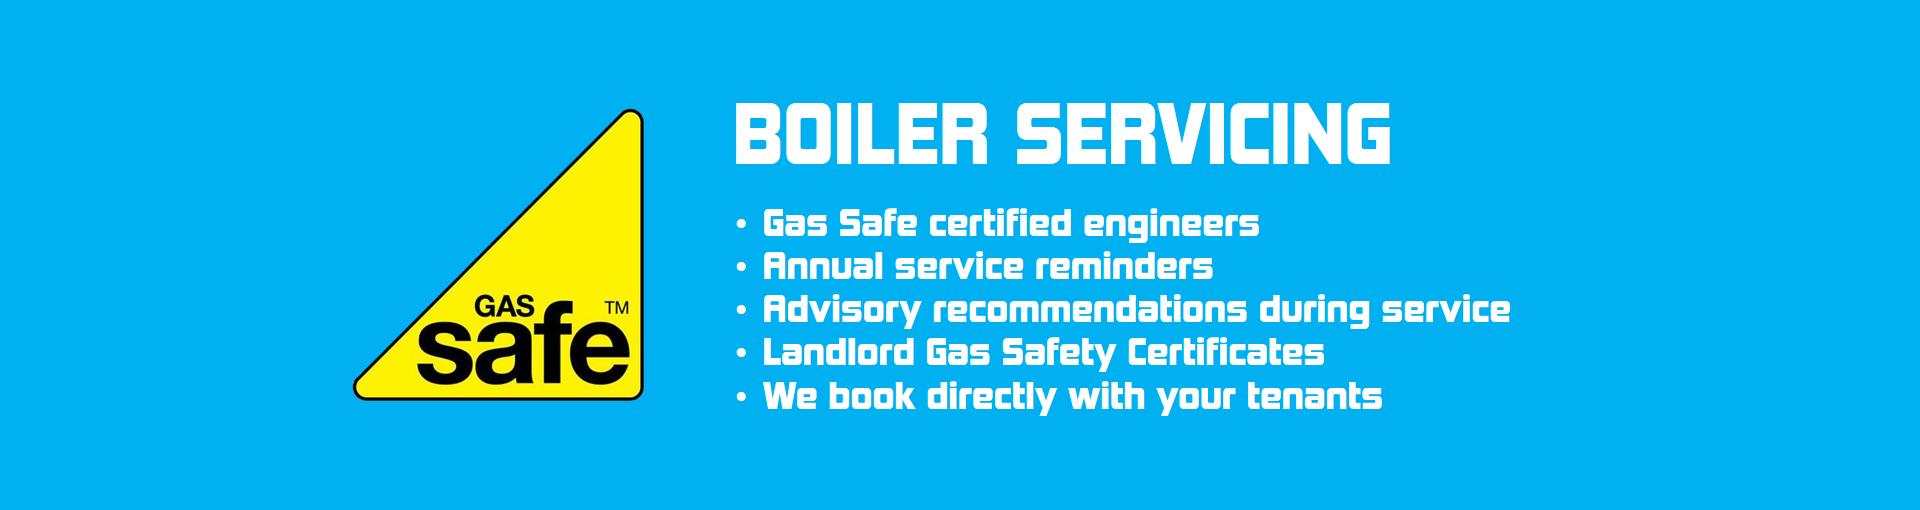 Boiler Servicing | Alloy Plumbing Services